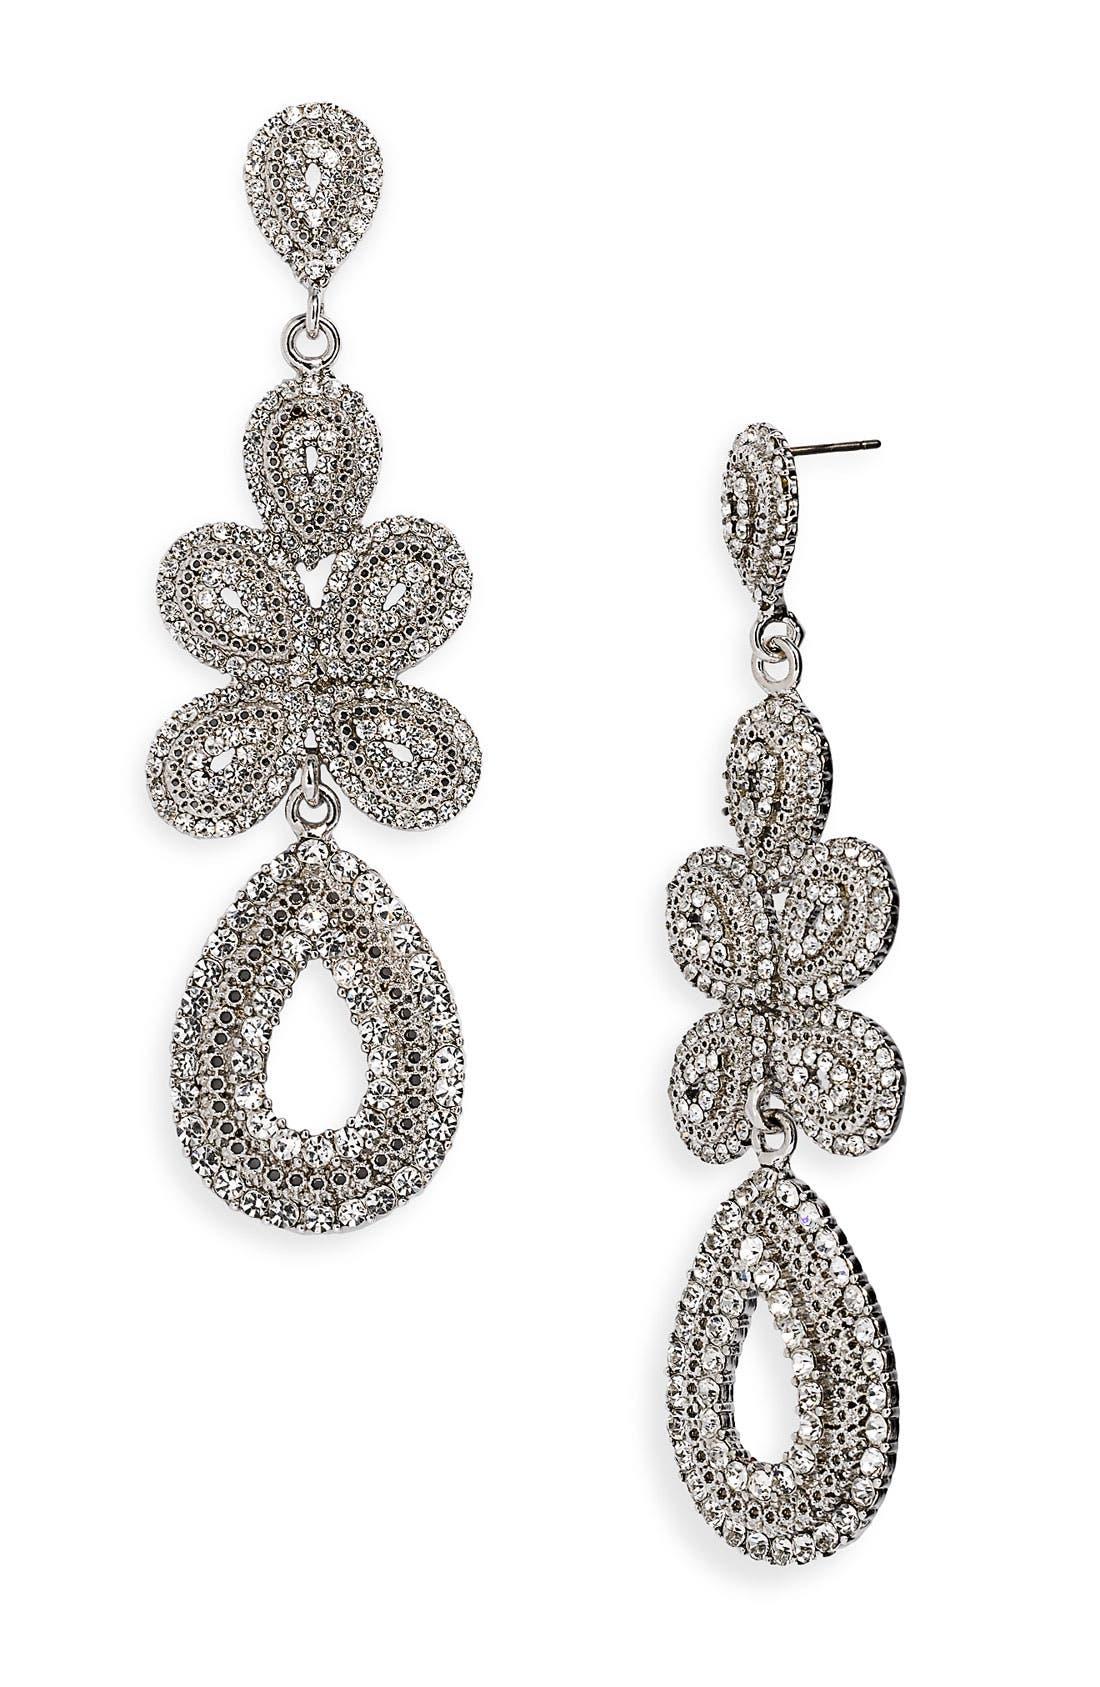 'Ornate' Linear Statement Earrings,                             Main thumbnail 4, color,